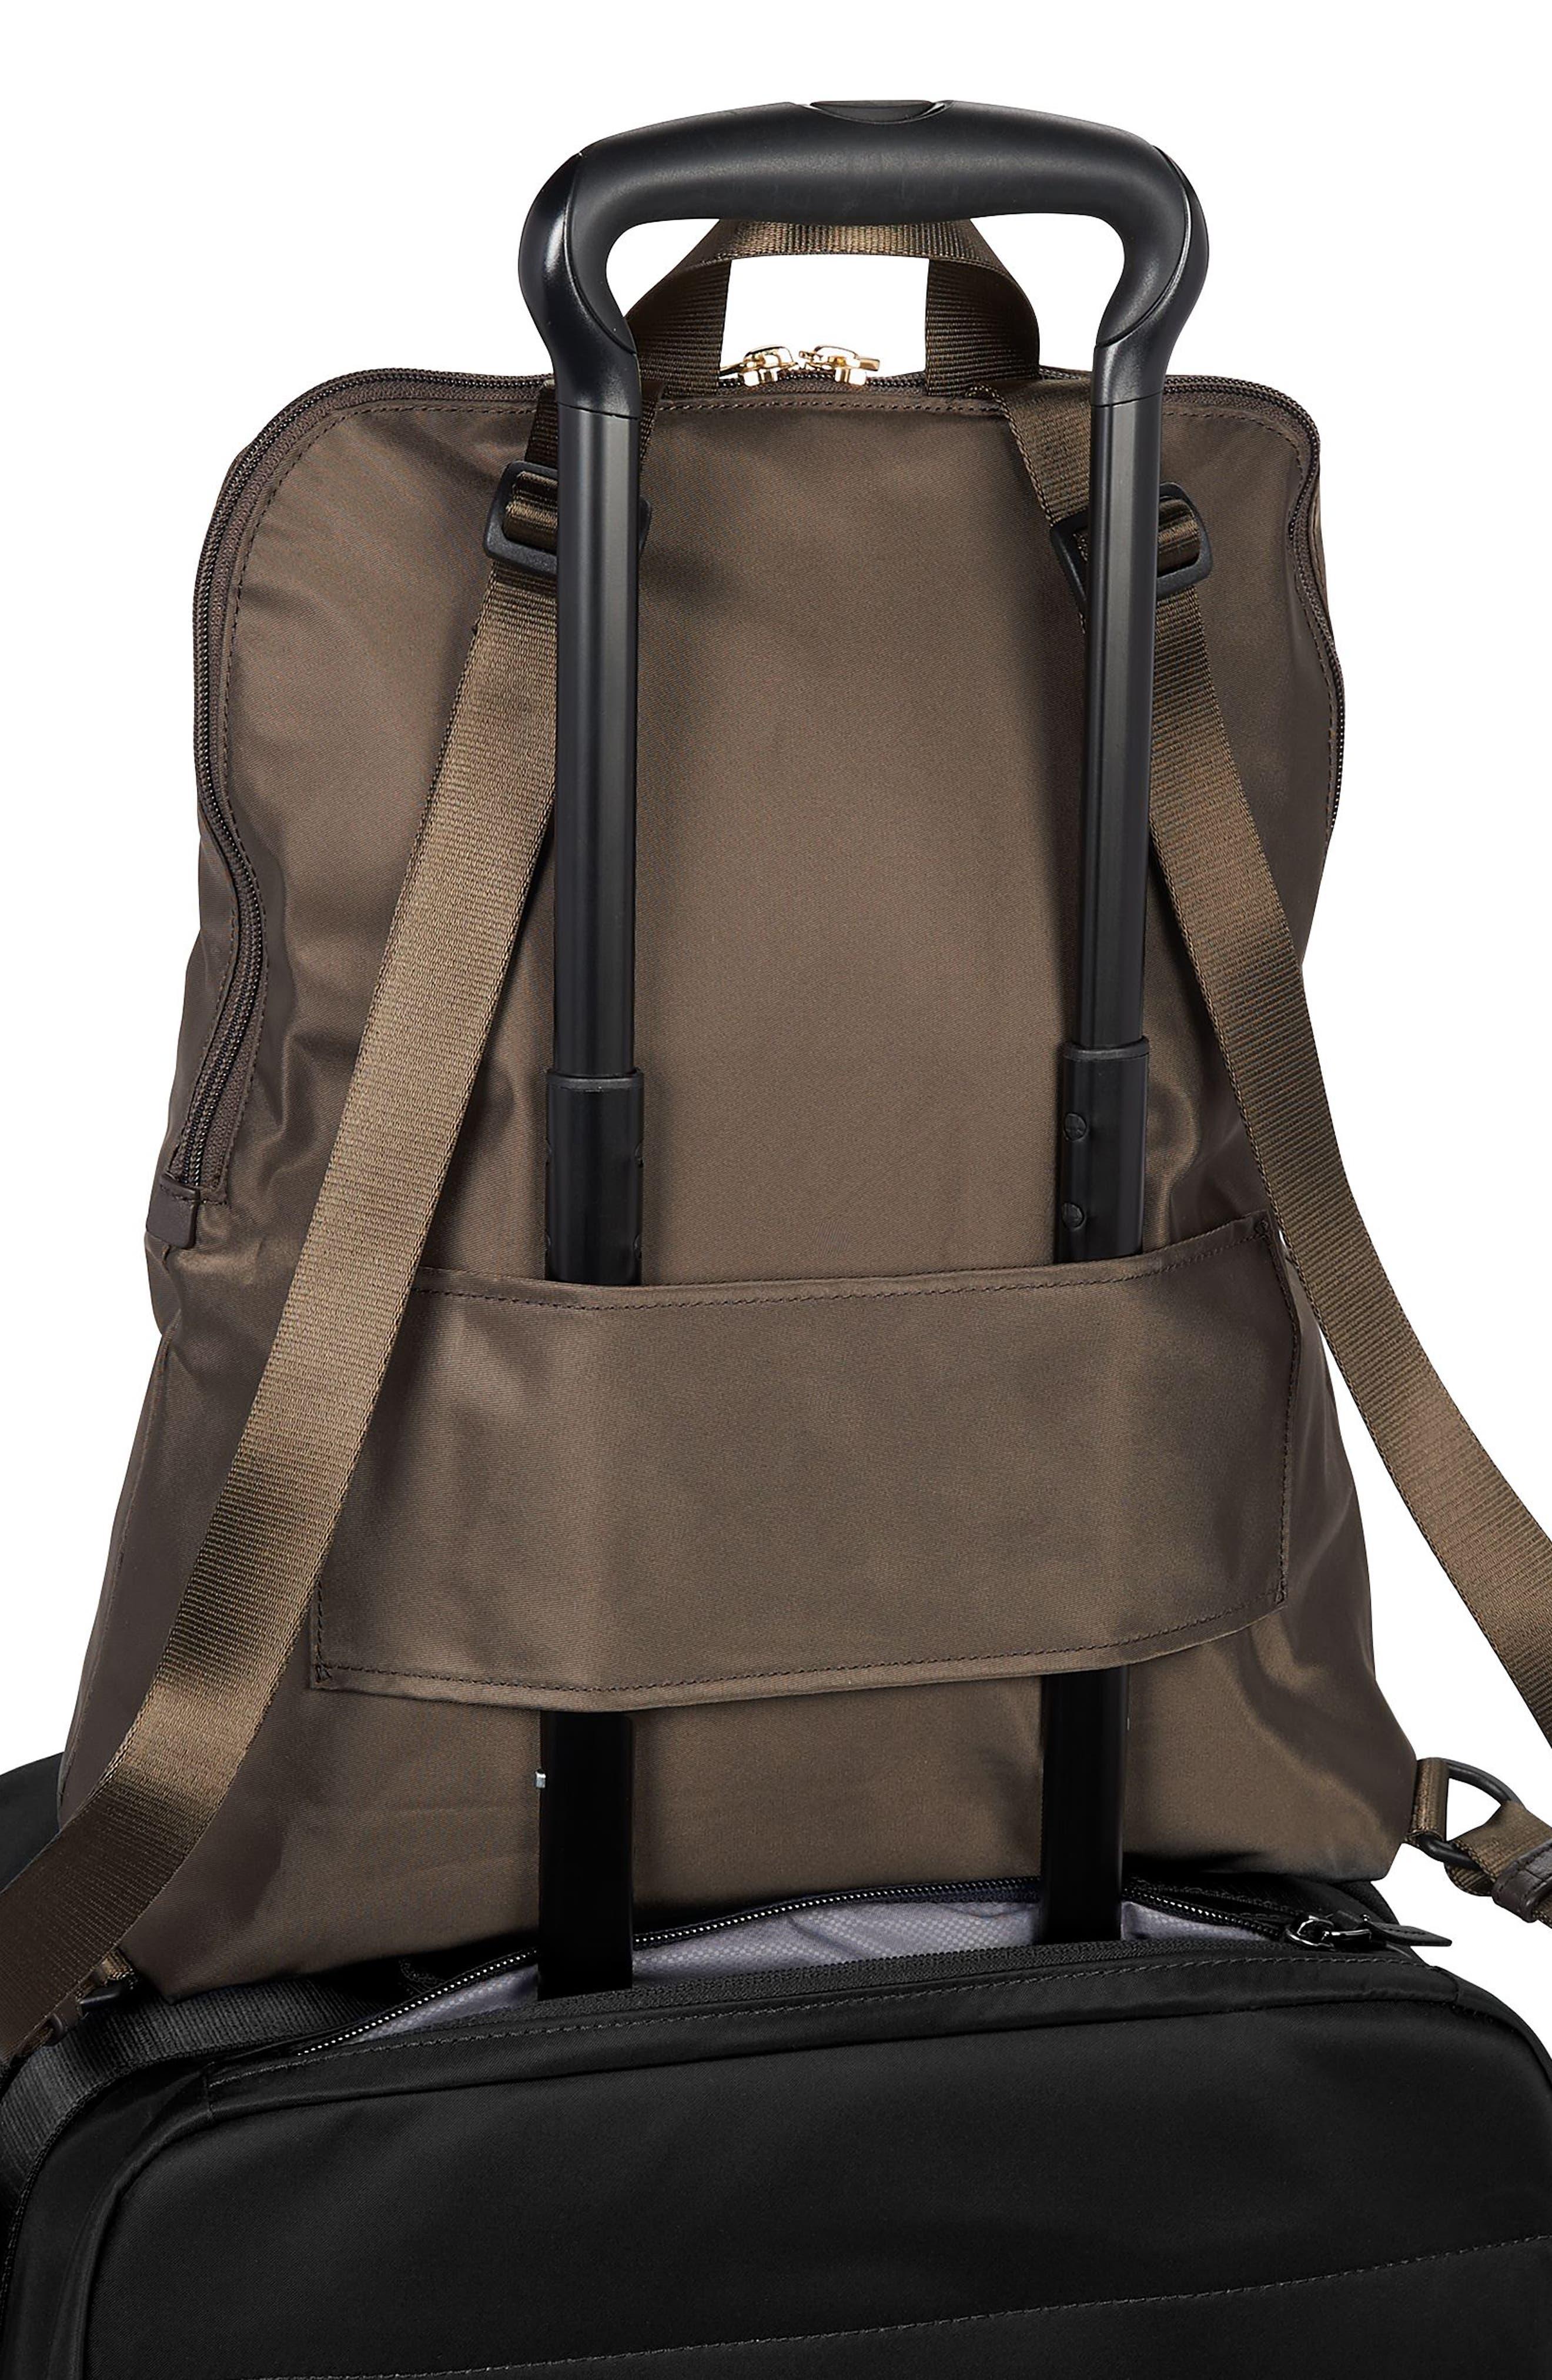 TUMI, Voyageur - Just in Case Nylon Travel Backpack, Alternate thumbnail 6, color, MINK